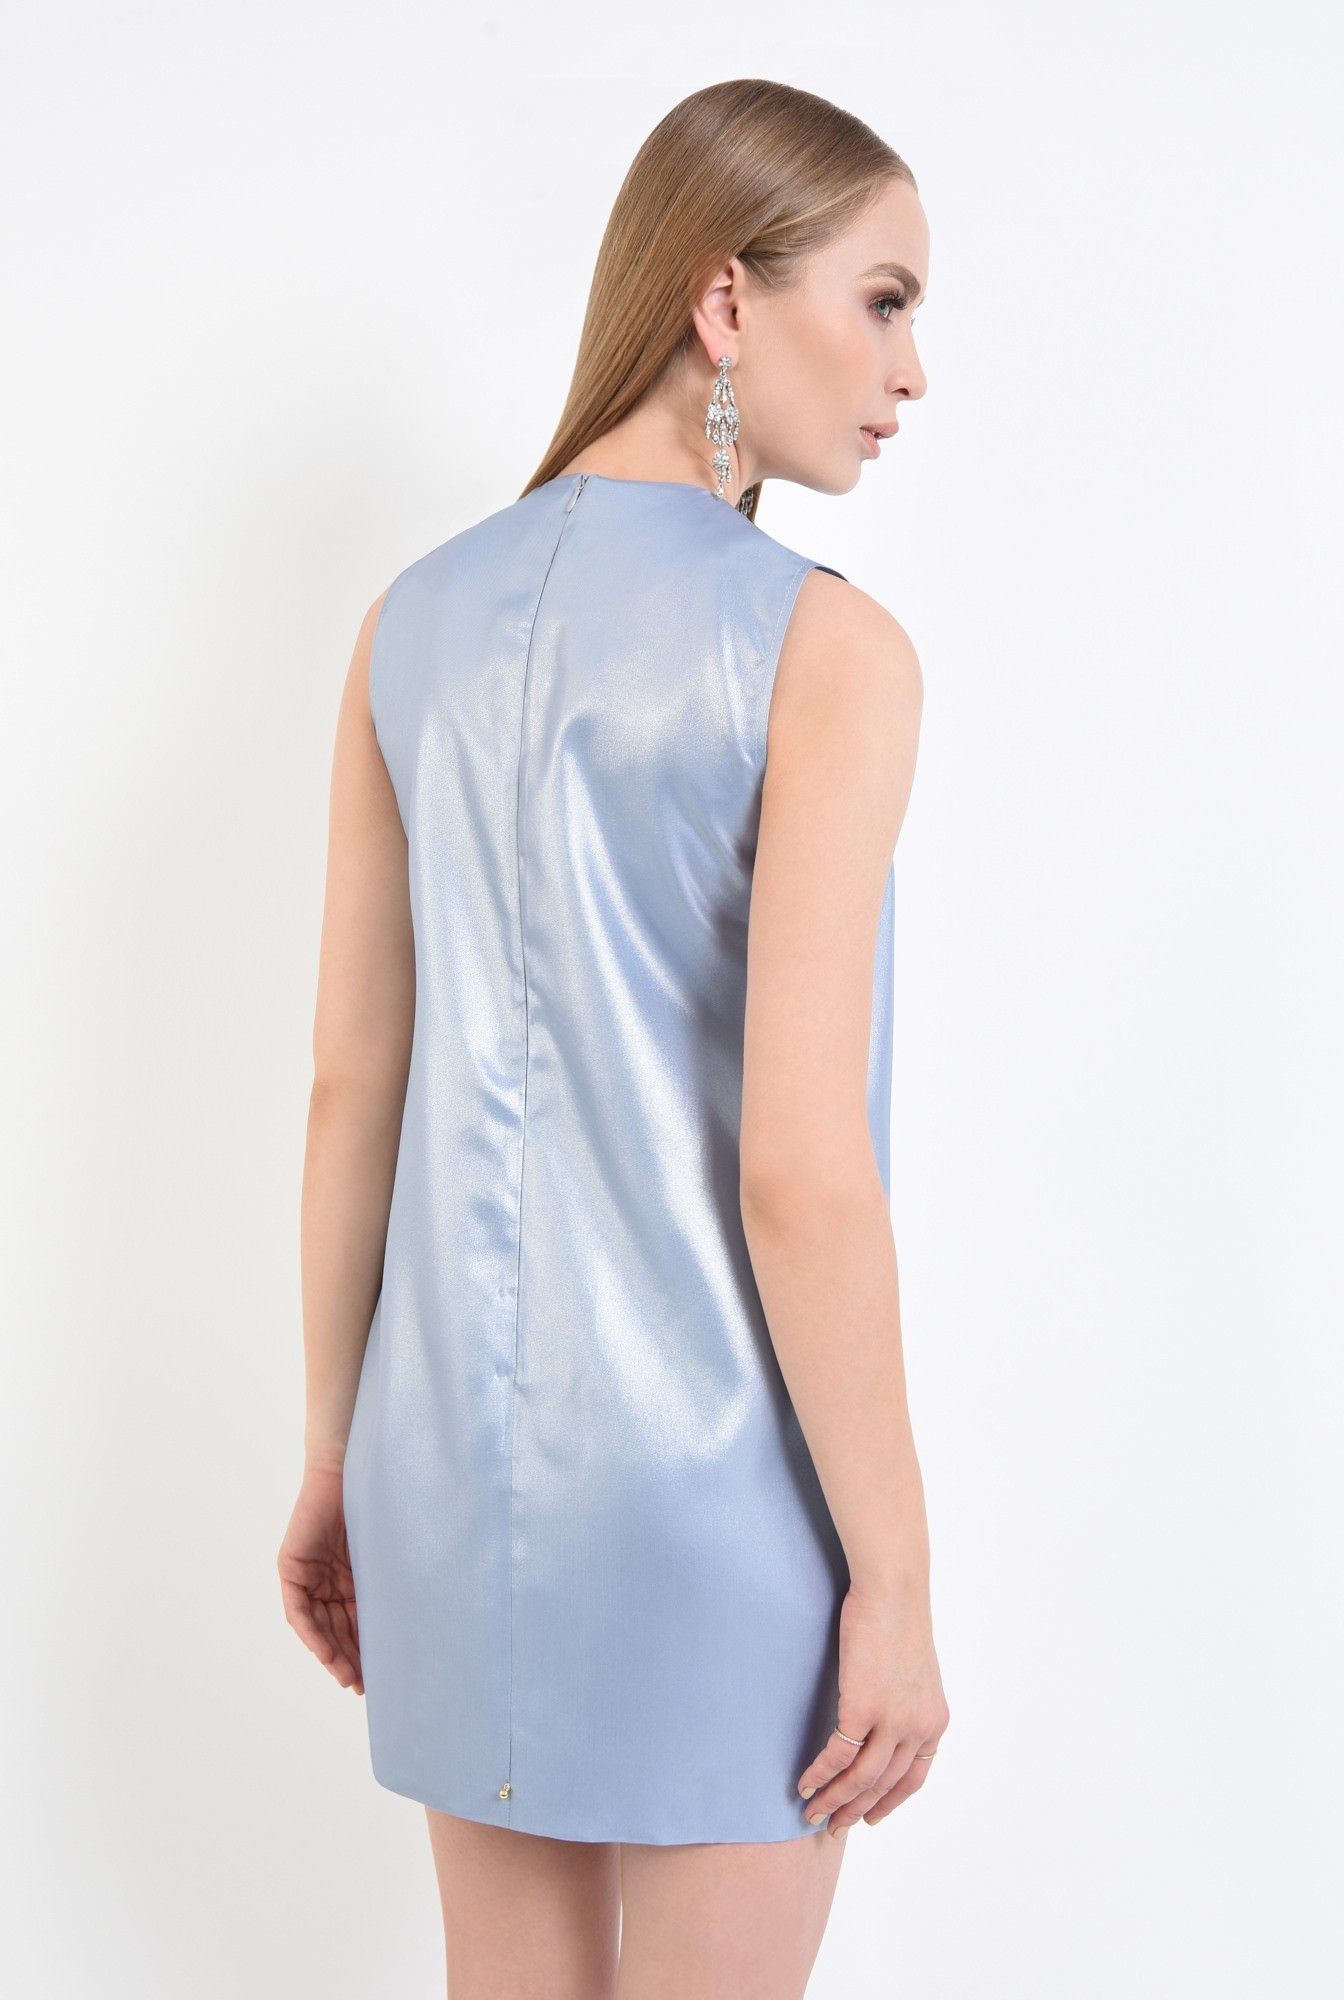 1 - rochie de ocazie, bleu, argintiu, scurta